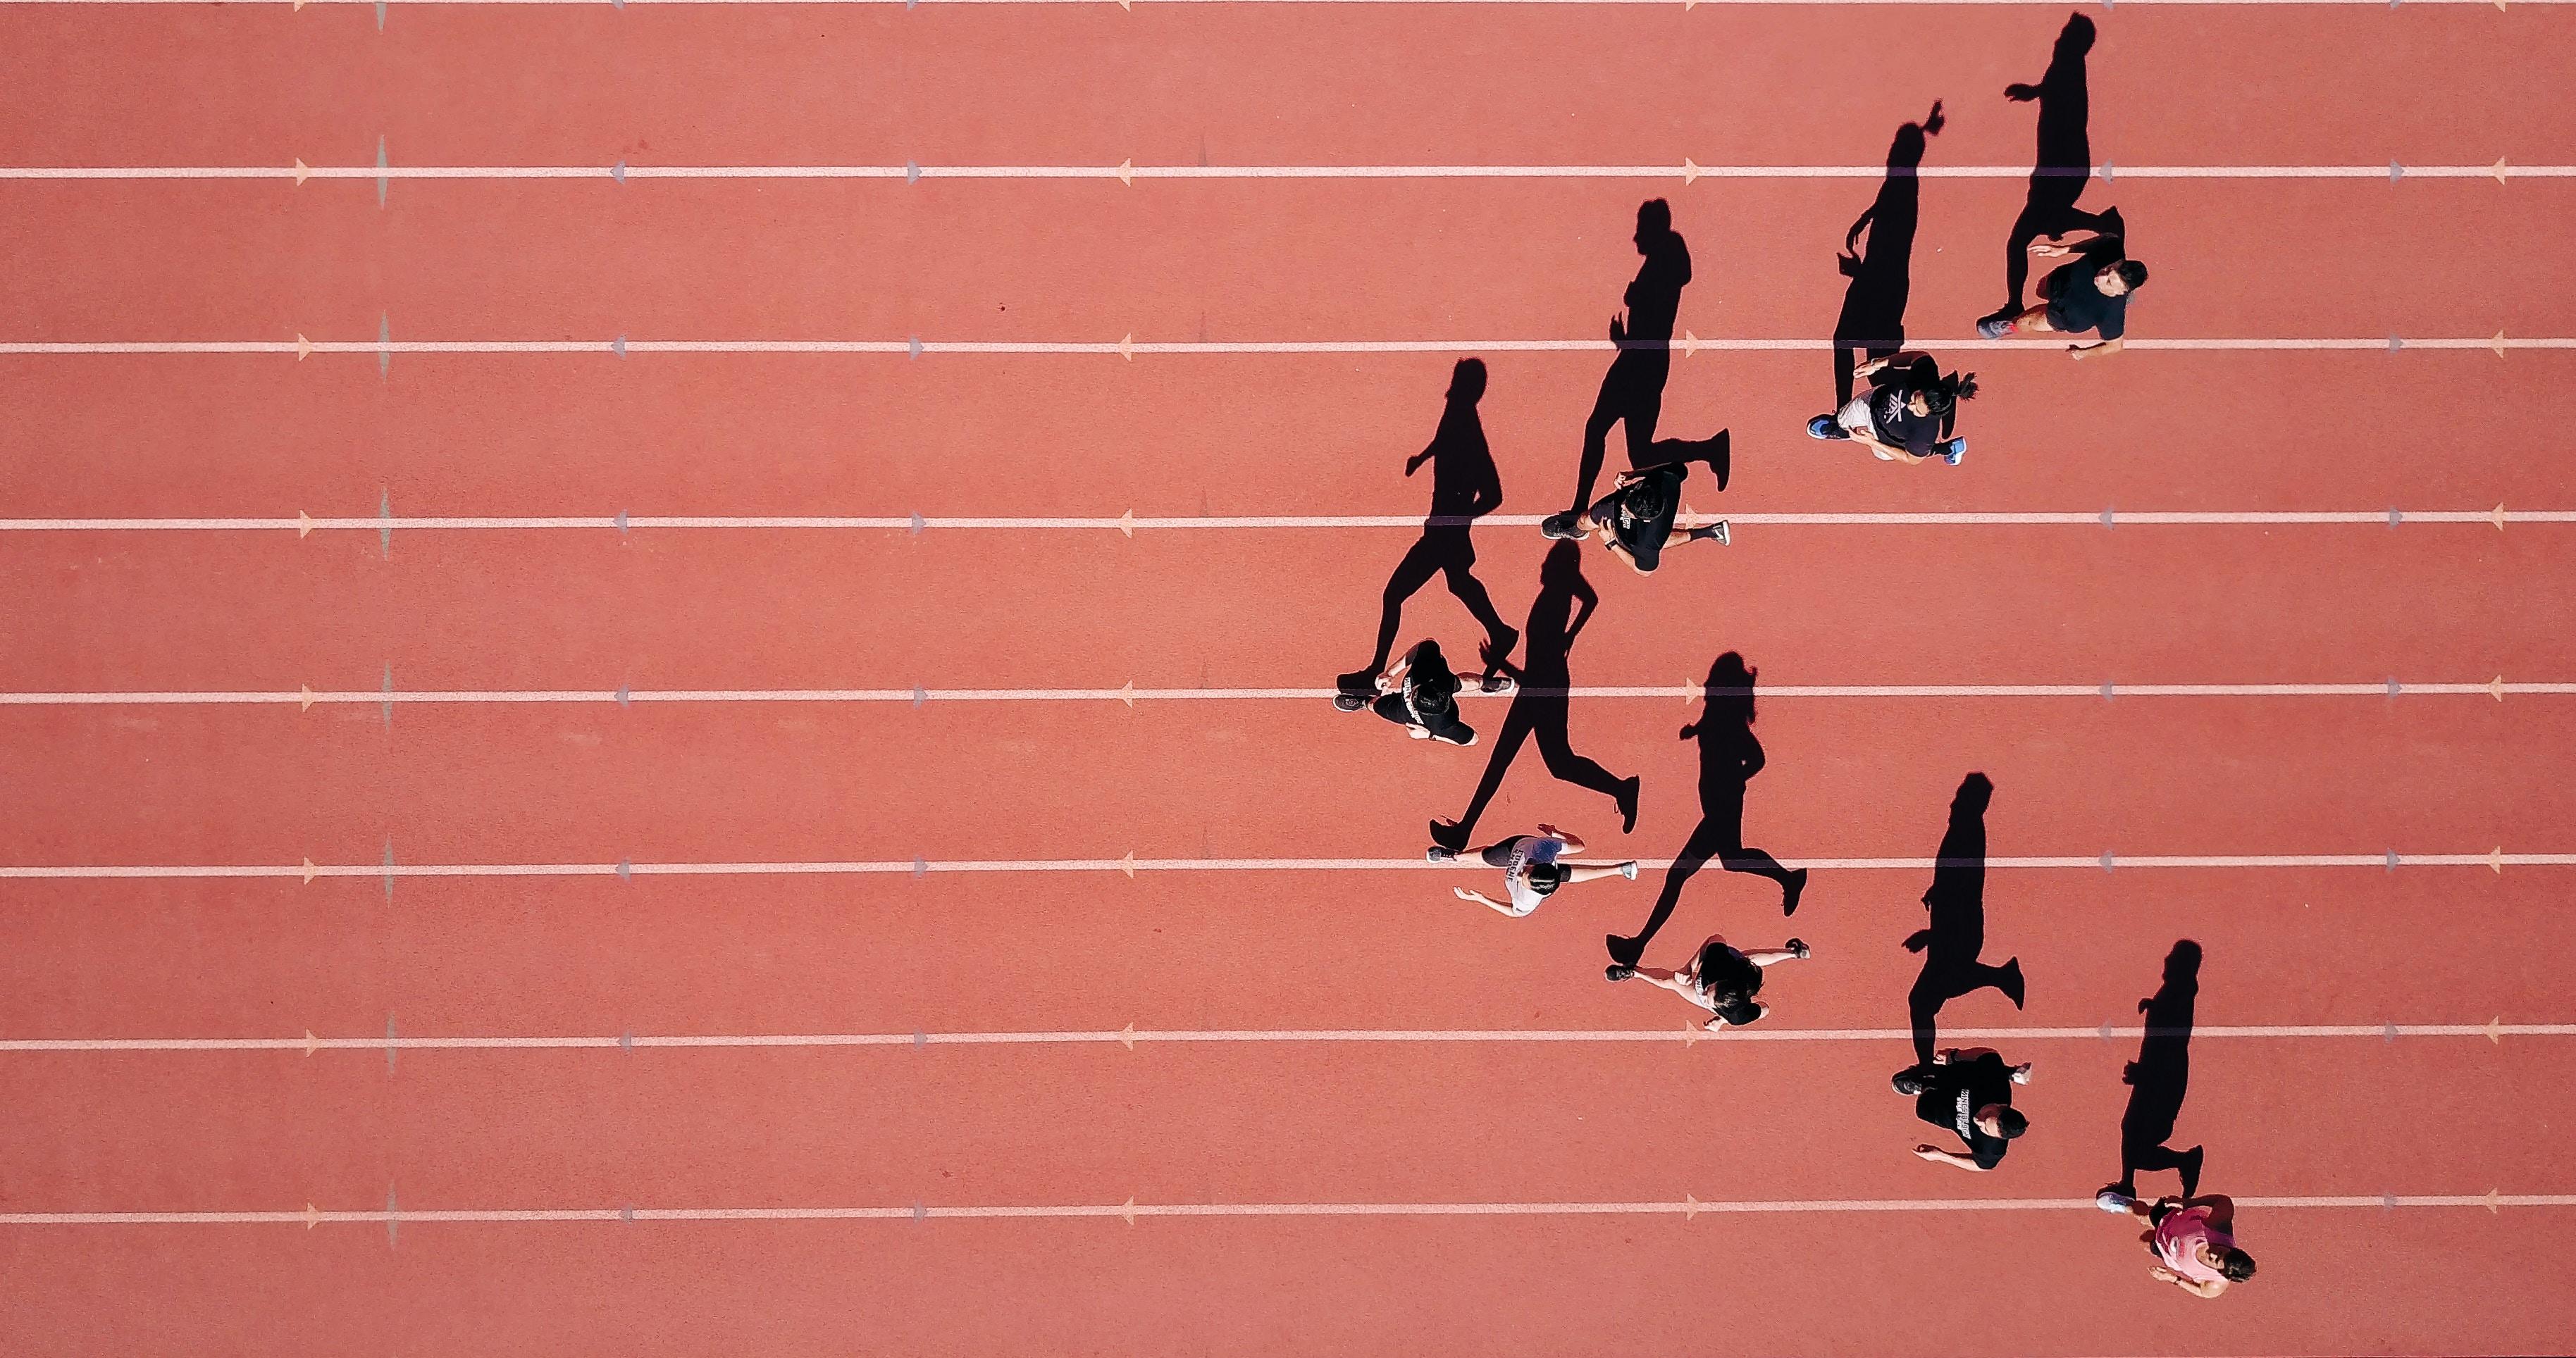 Lojalitetsprogram Sportidealisten SportManagement Idrottsvetare SportJobb IdrottsJobb